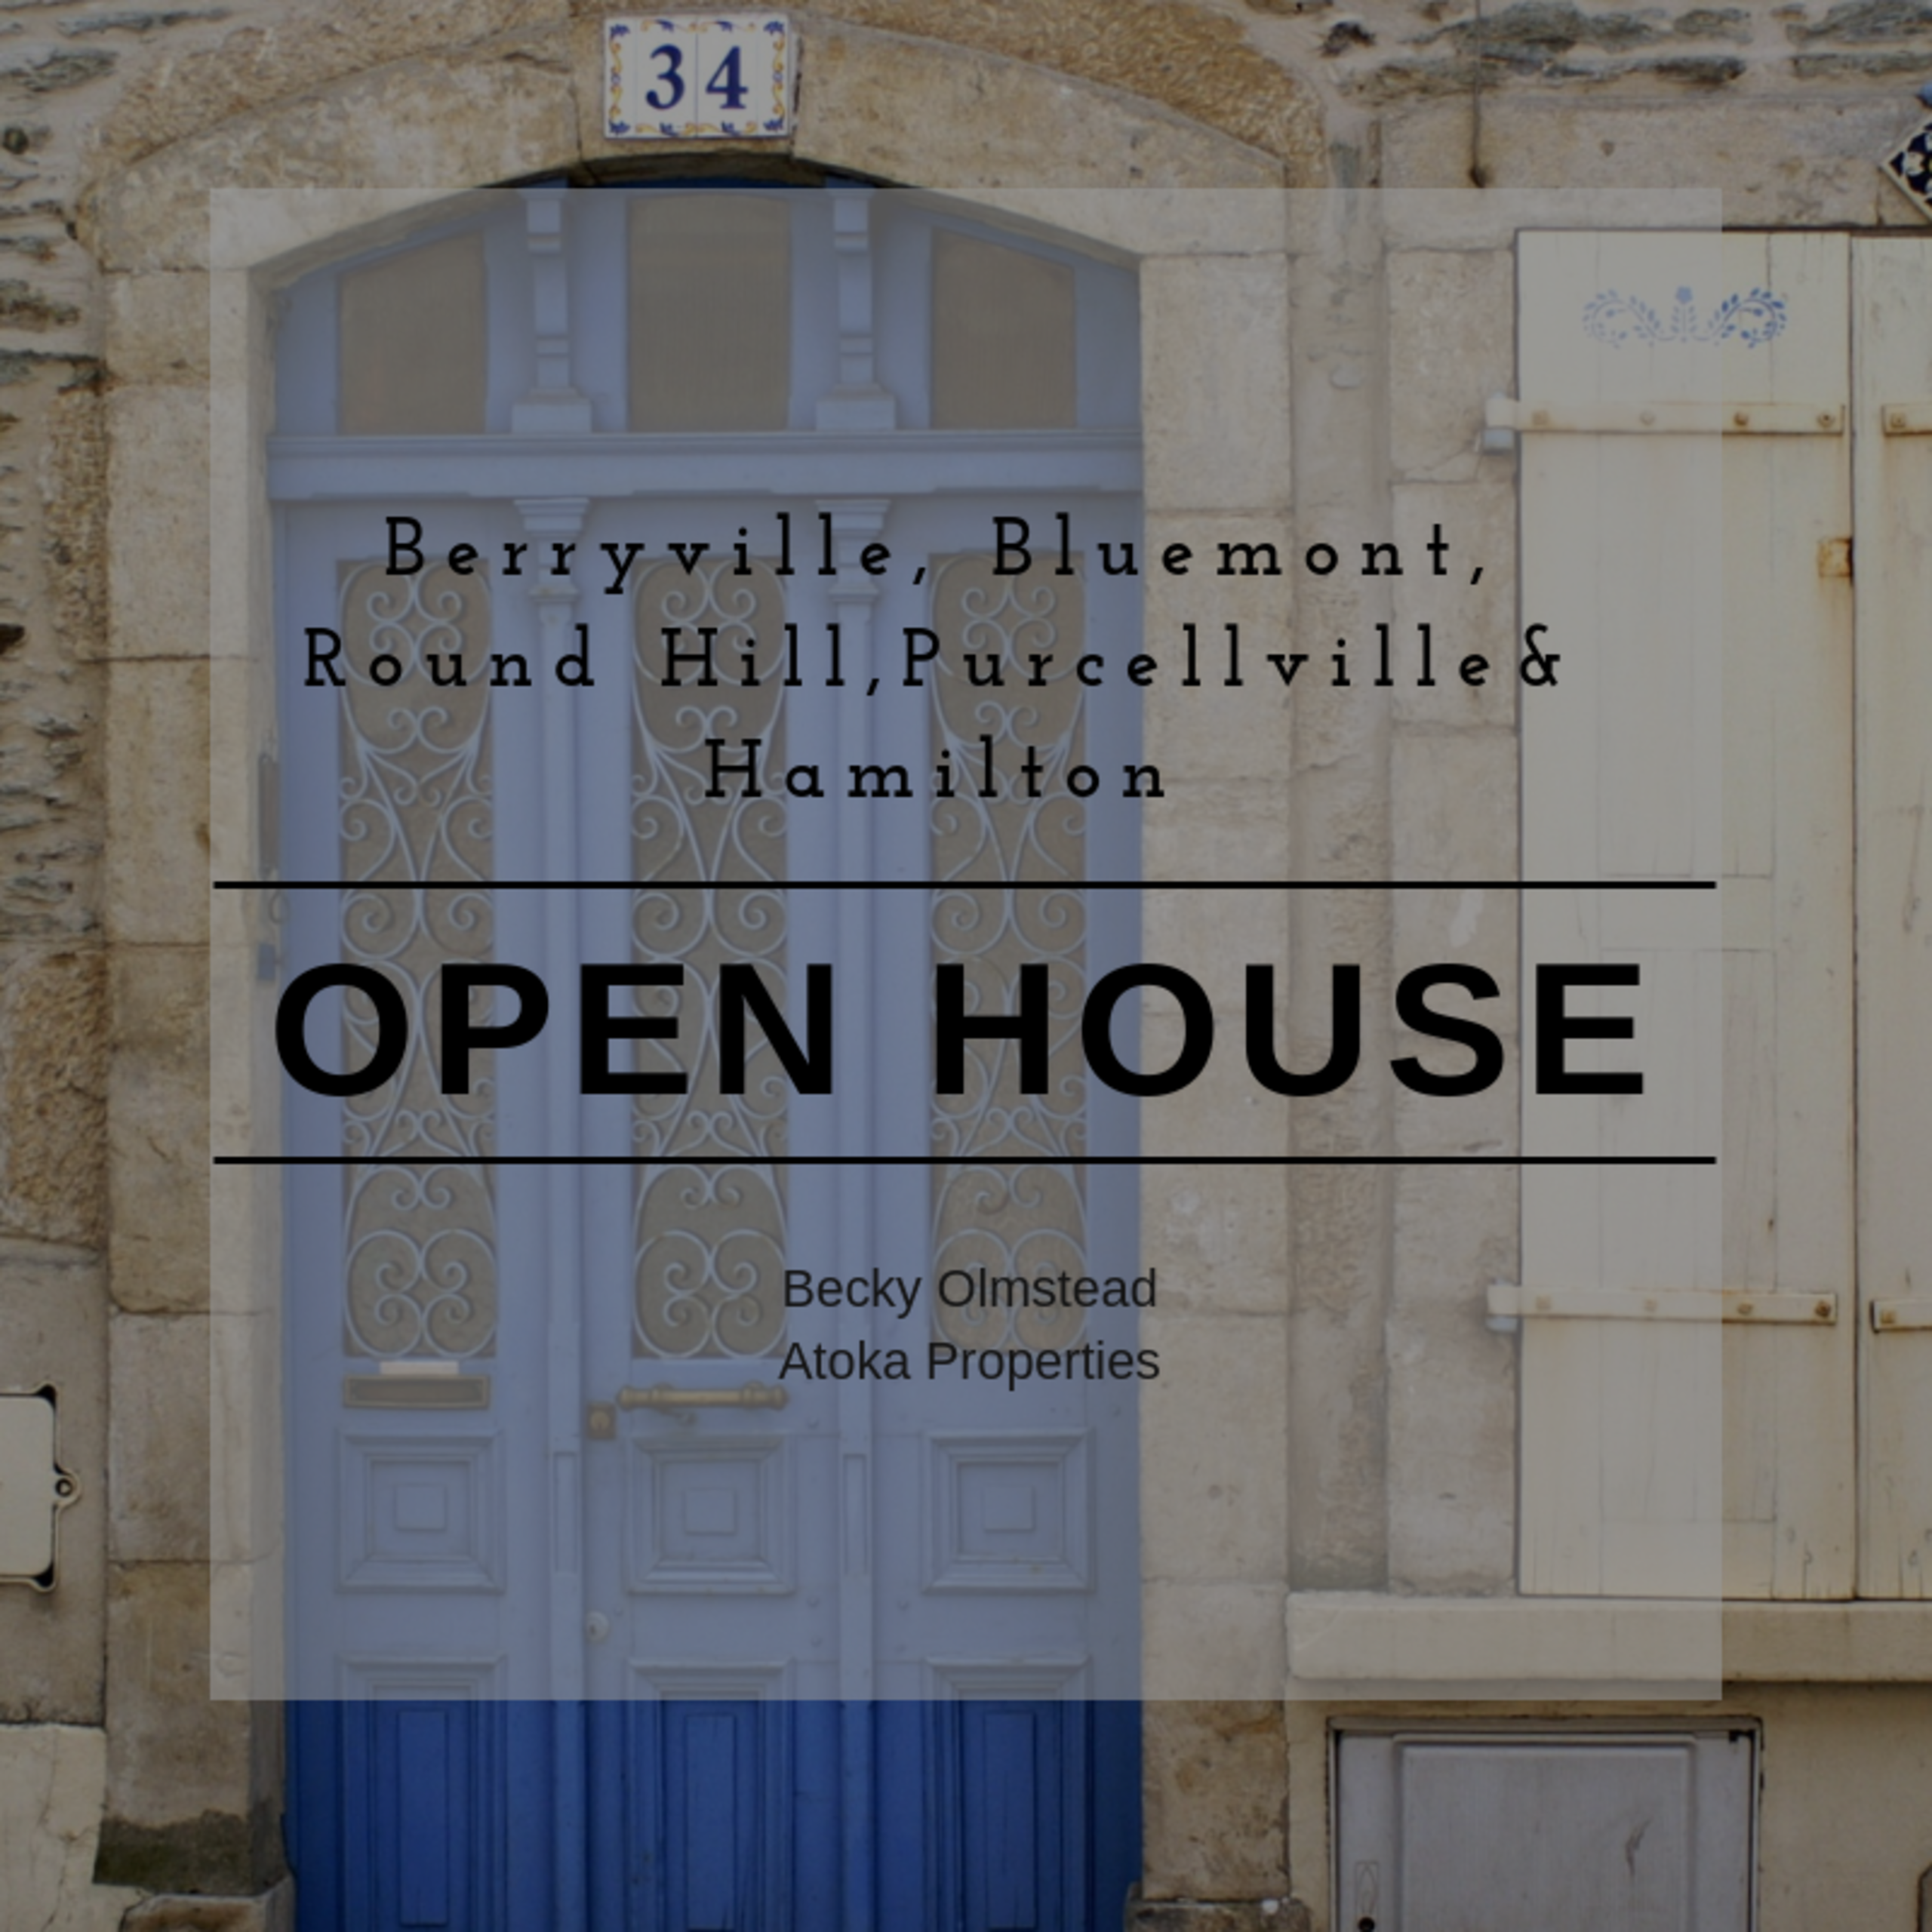 OPEN HOUSE LIST 10/3/18 – 10/4/18